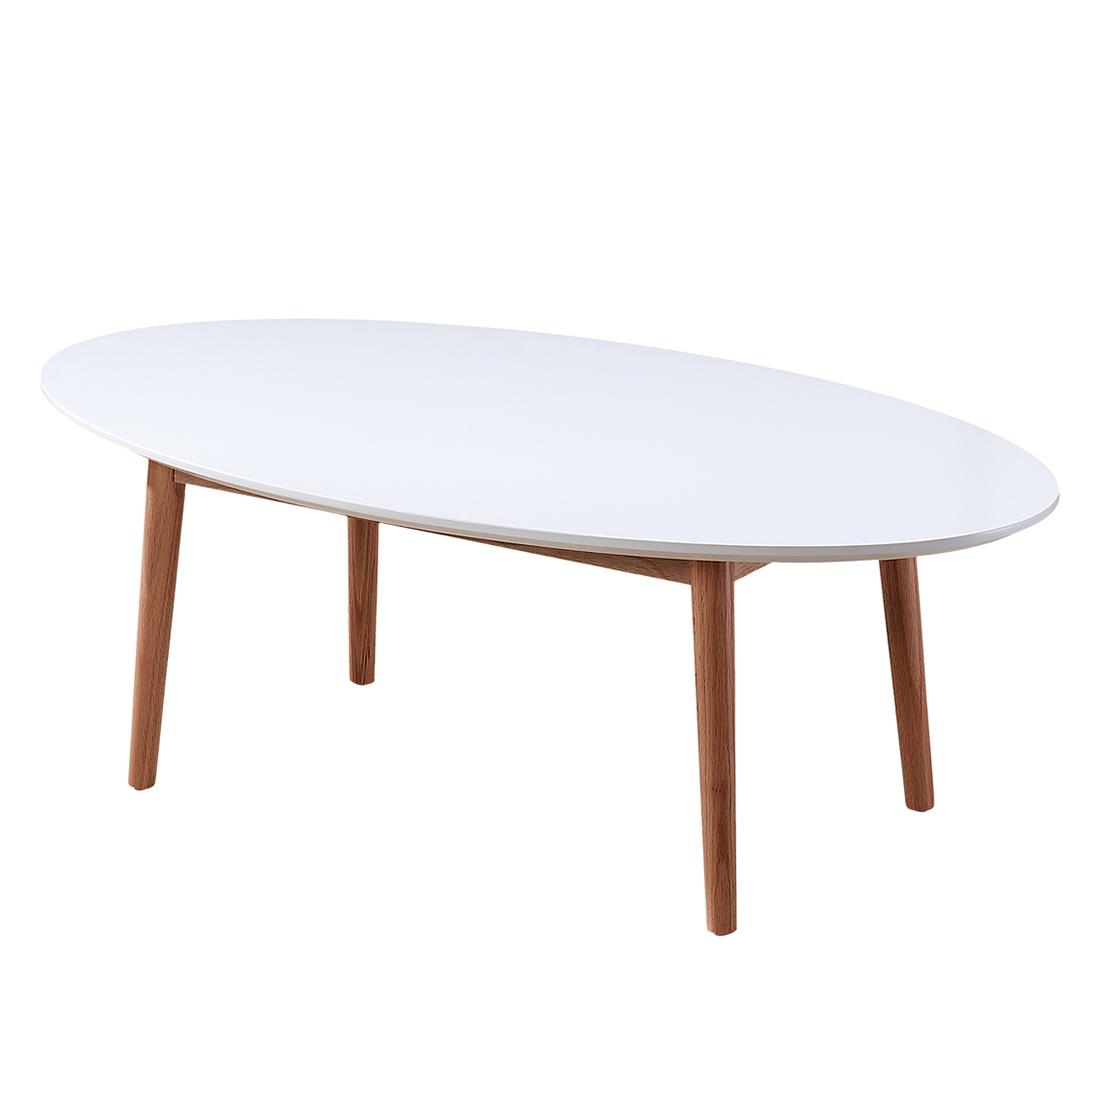 couchtisch eiche oval. Black Bedroom Furniture Sets. Home Design Ideas